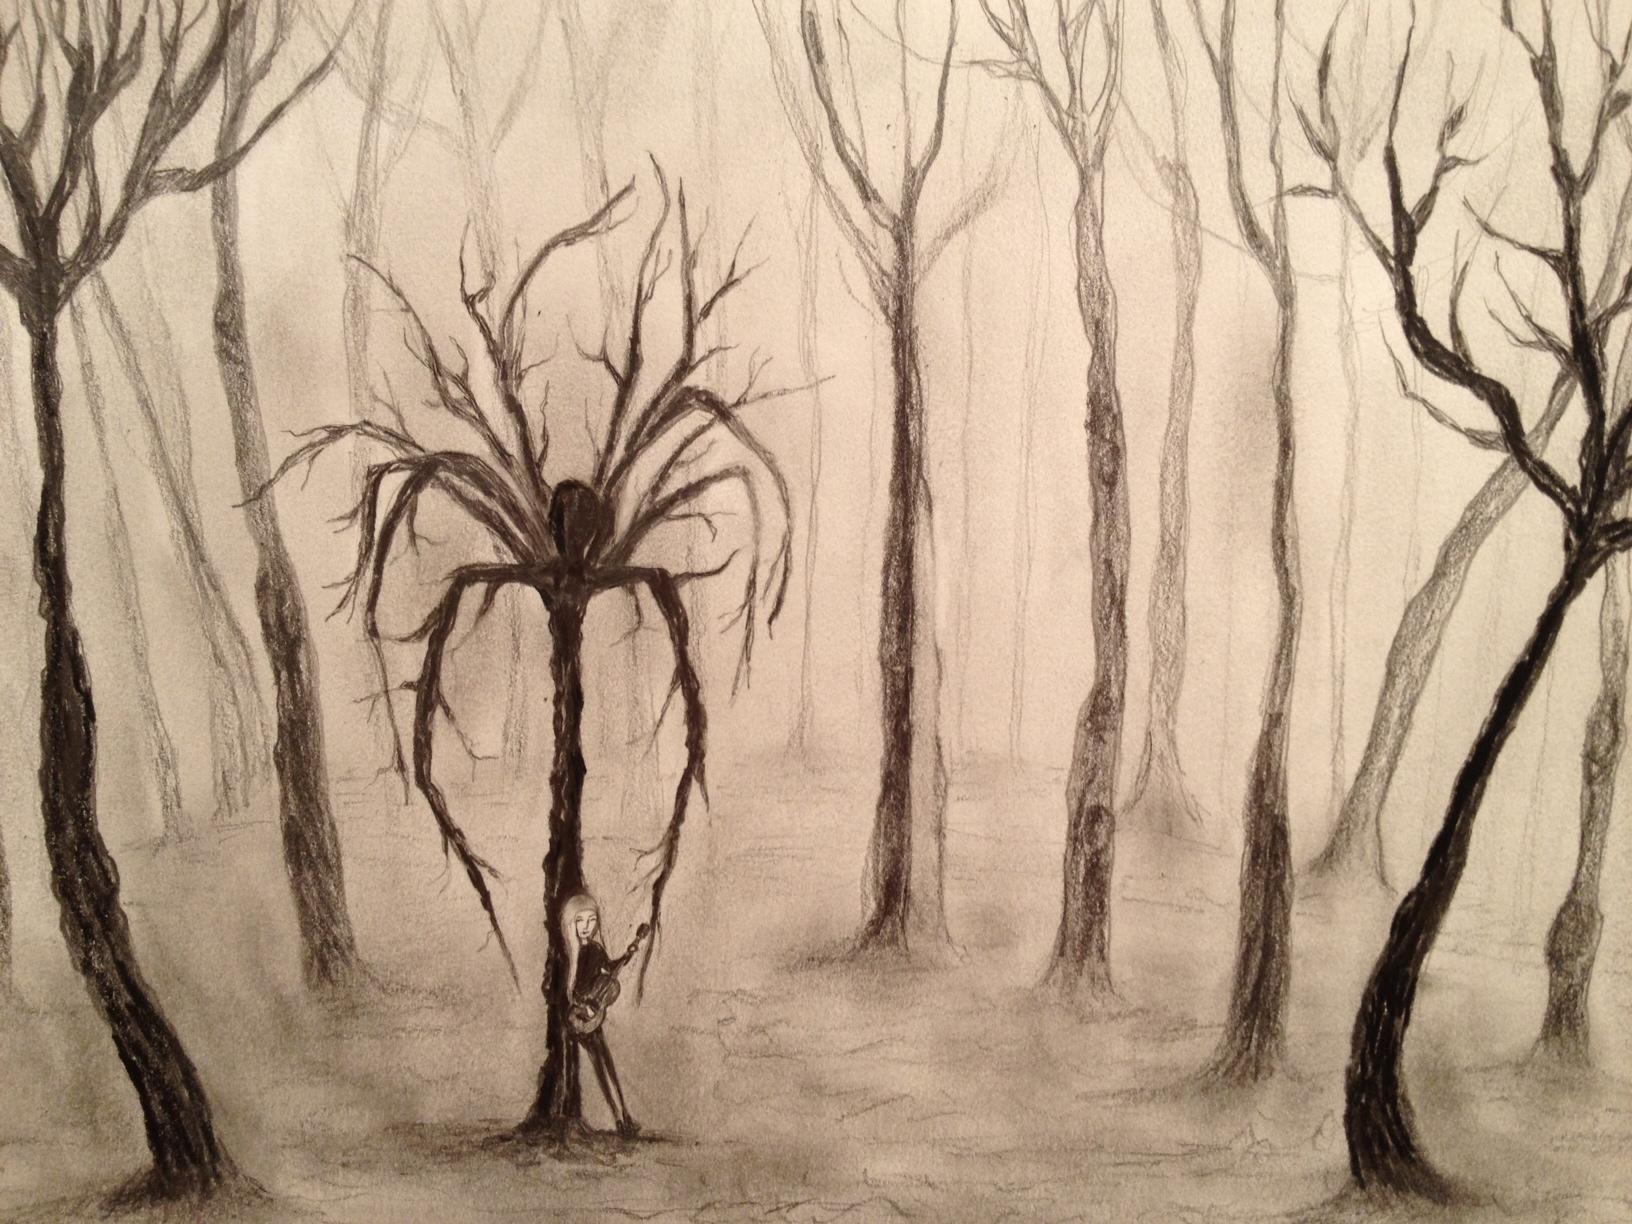 Drawn slender man landscape Man #2 Morgenstern Man –